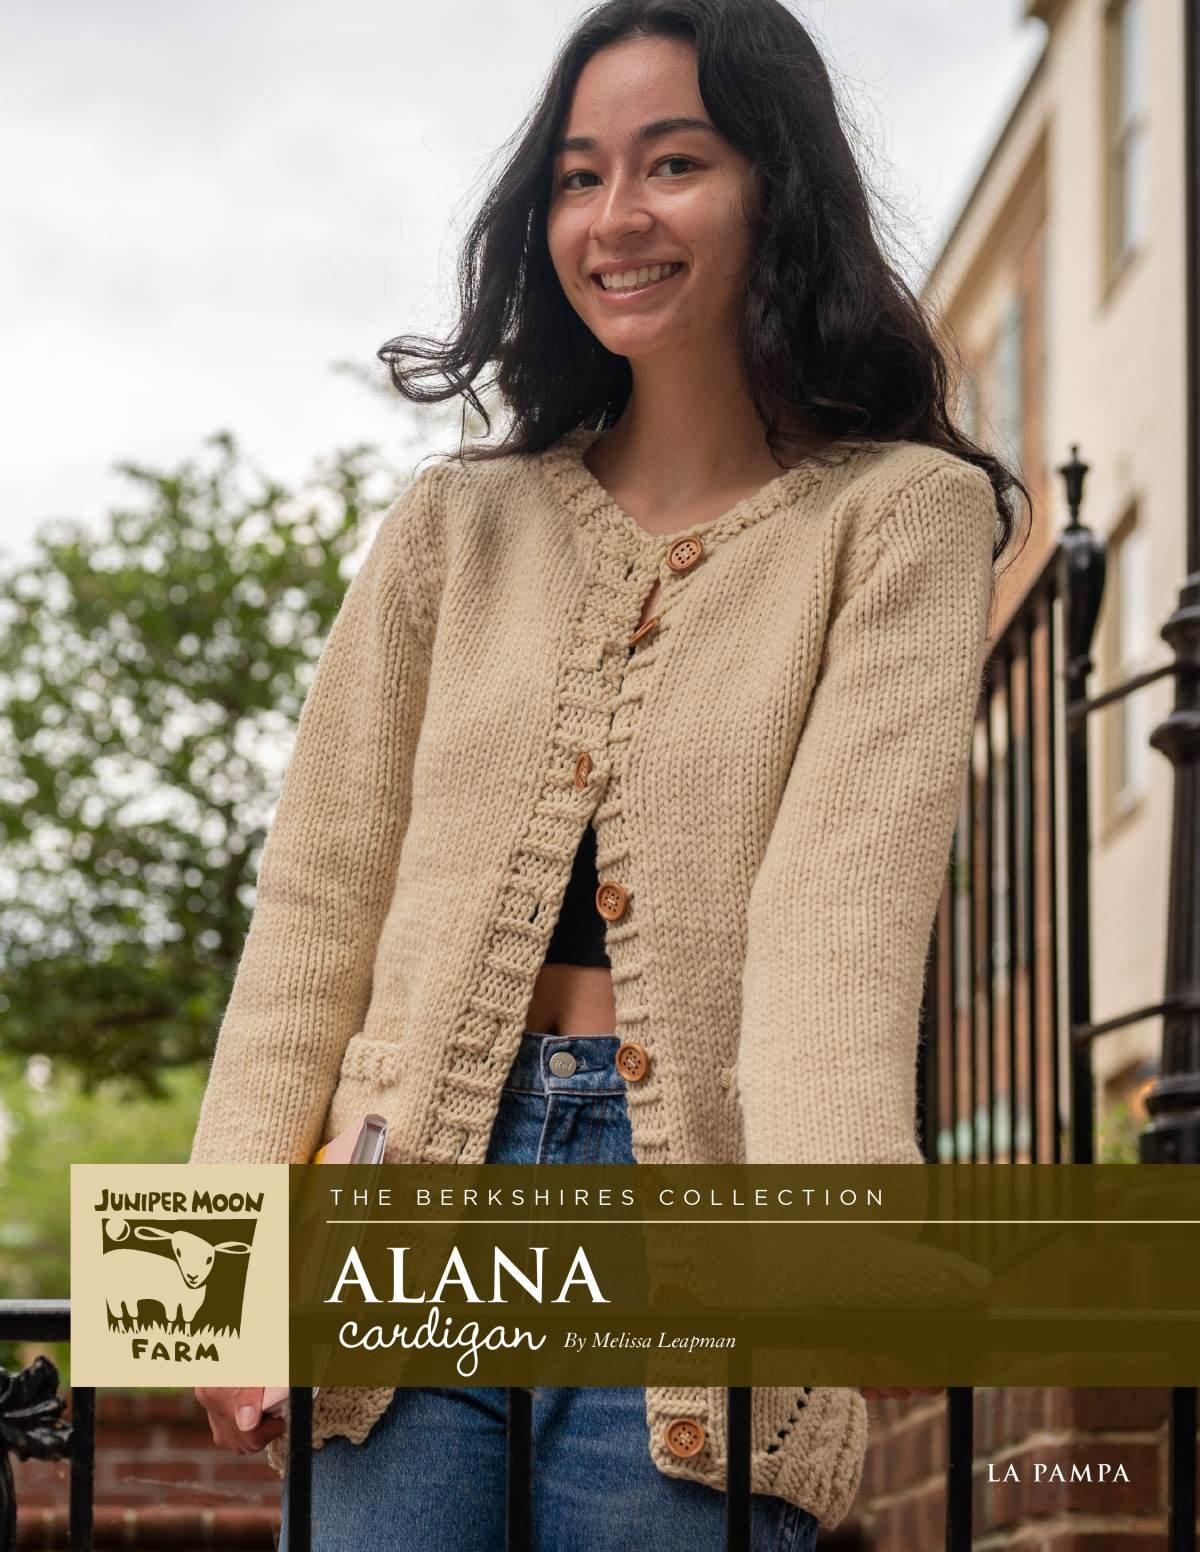 Alana Cardigan pattern